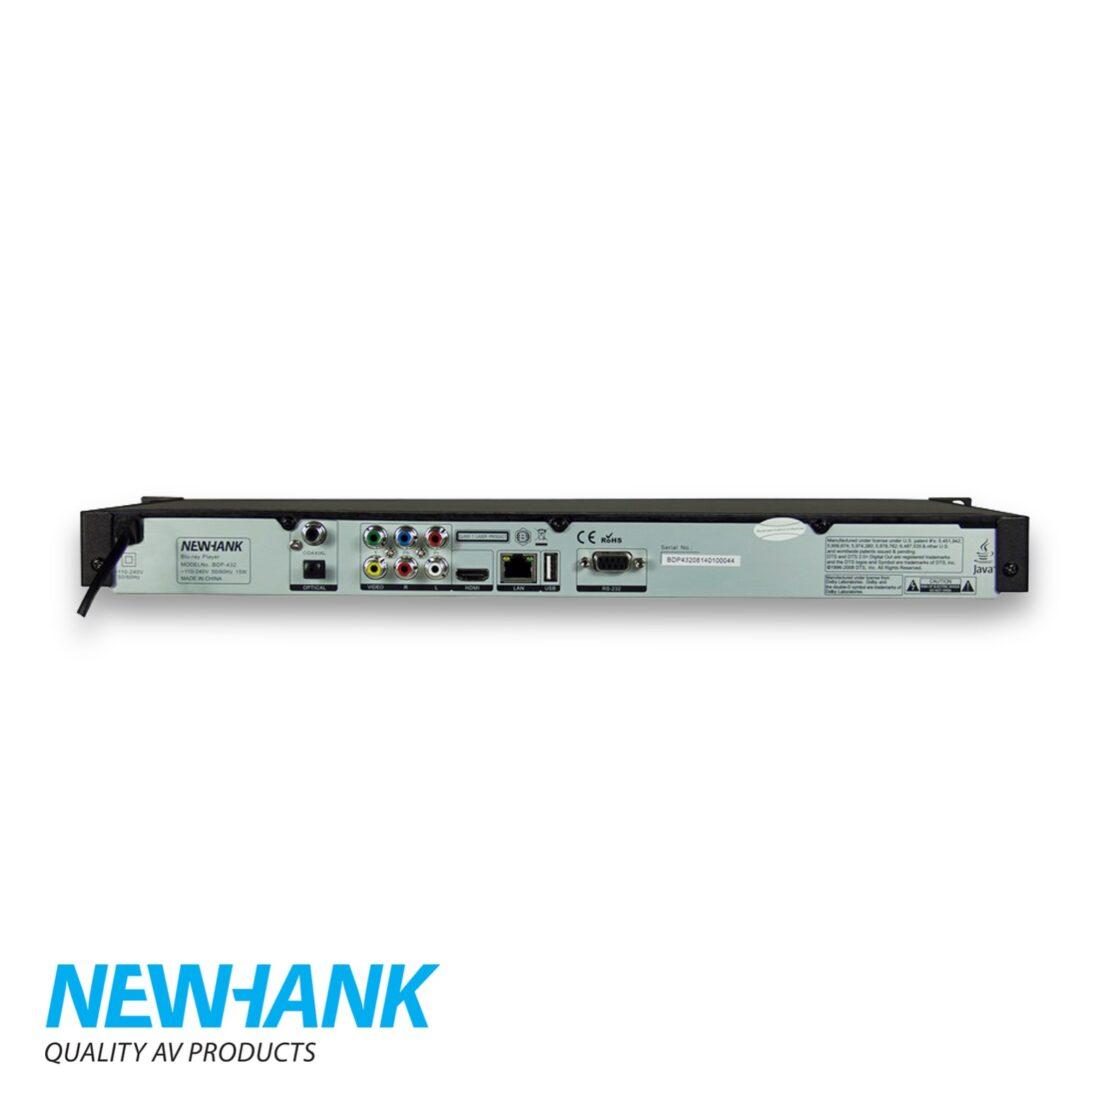 Newhank BDP 432